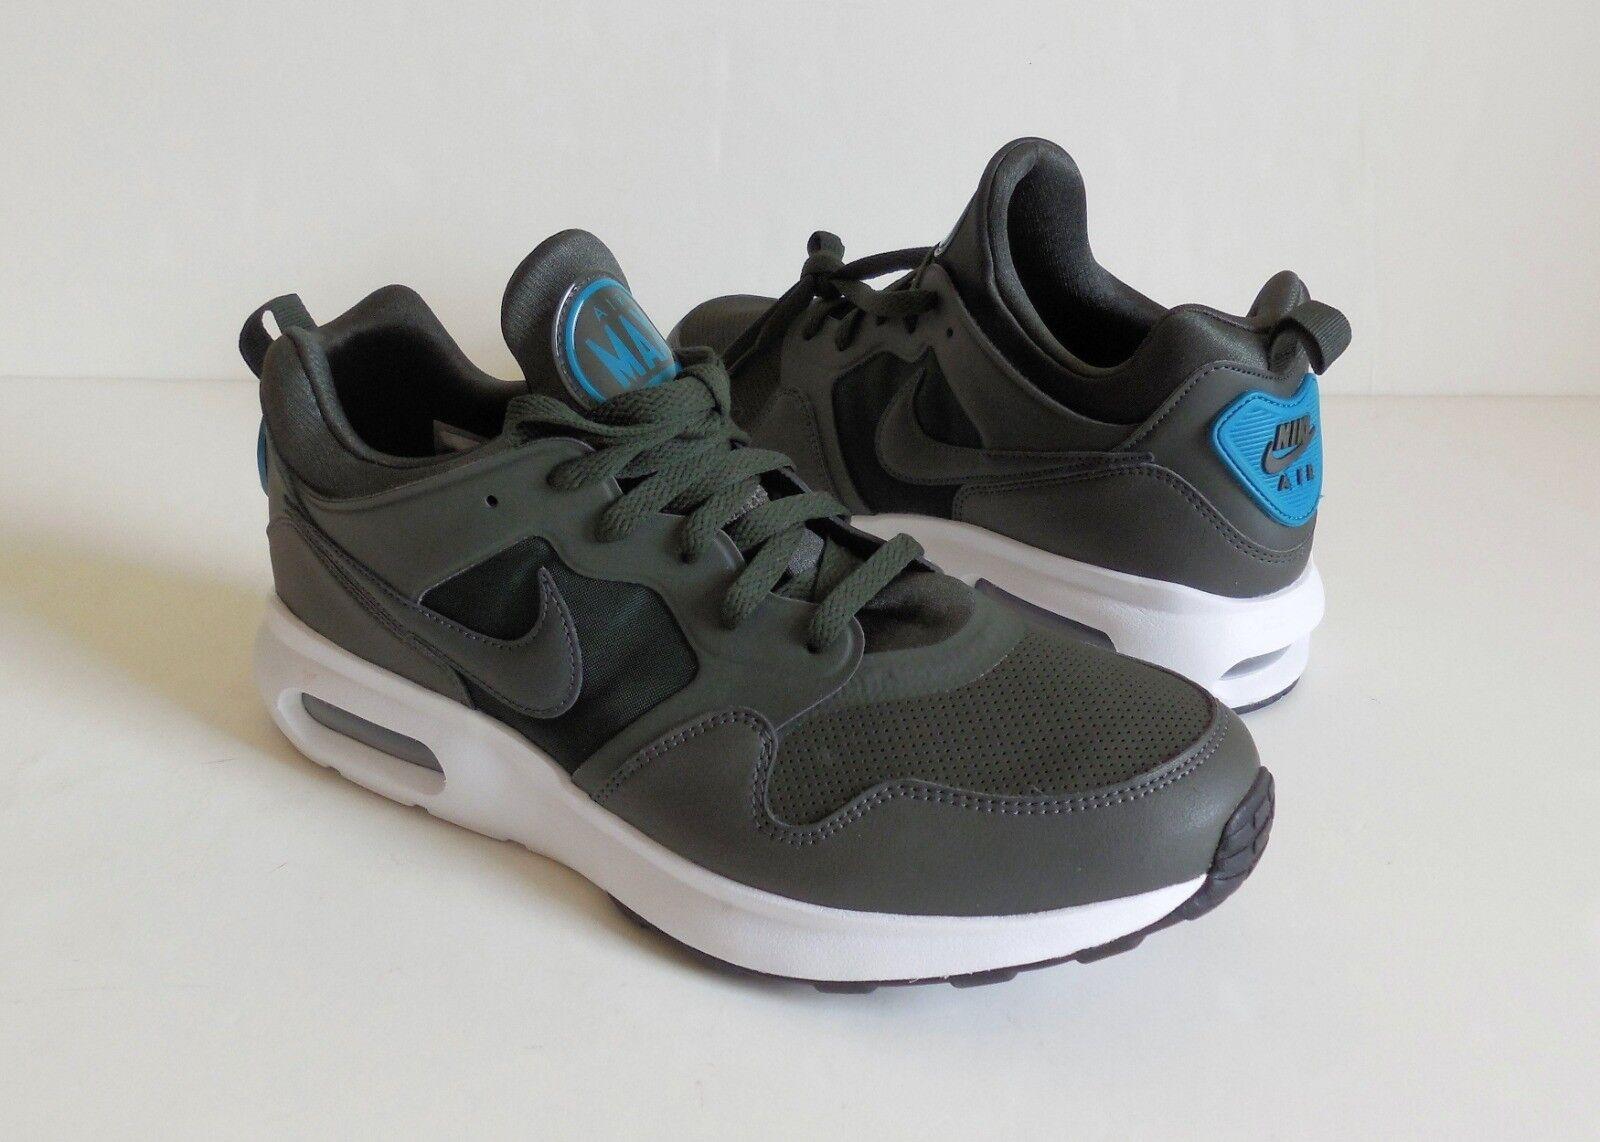 65480f7f64159 Nike Air Max Prime SL Running shoes 11.5 New No Box 876069-300 Men's ...